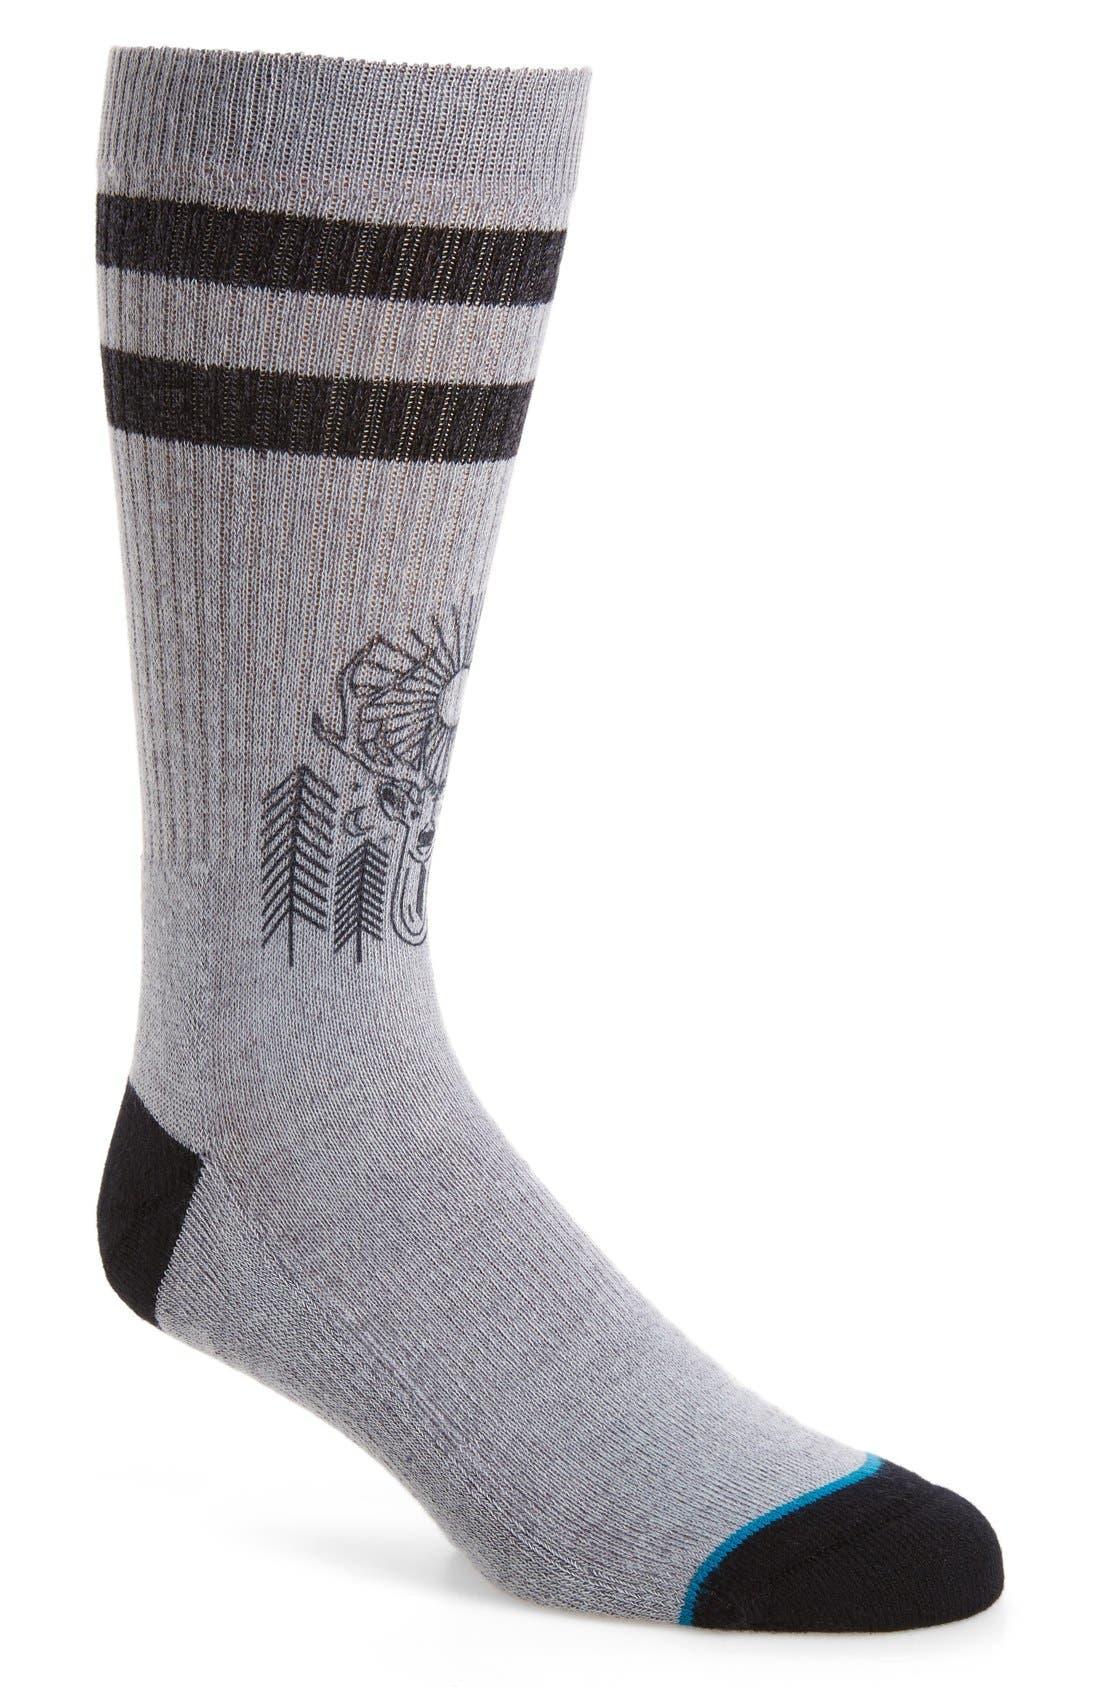 Stance Peaceful Classic Crew Socks